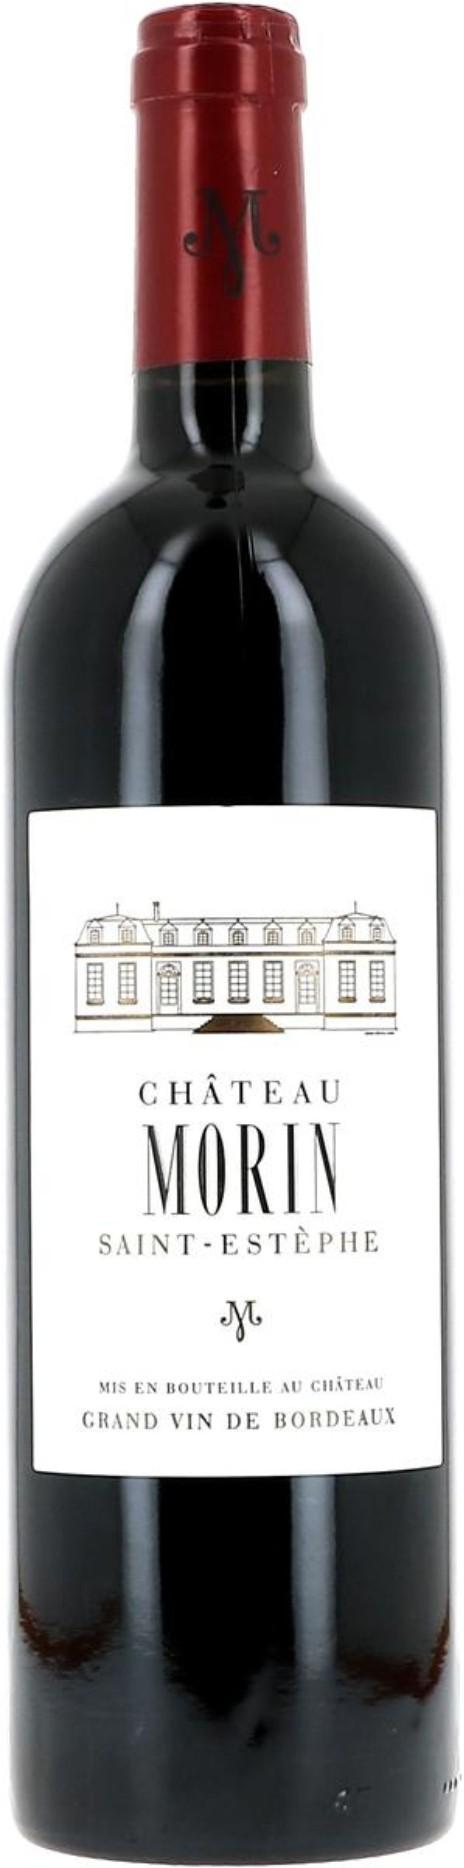 Chateau Morin Saint Estephe